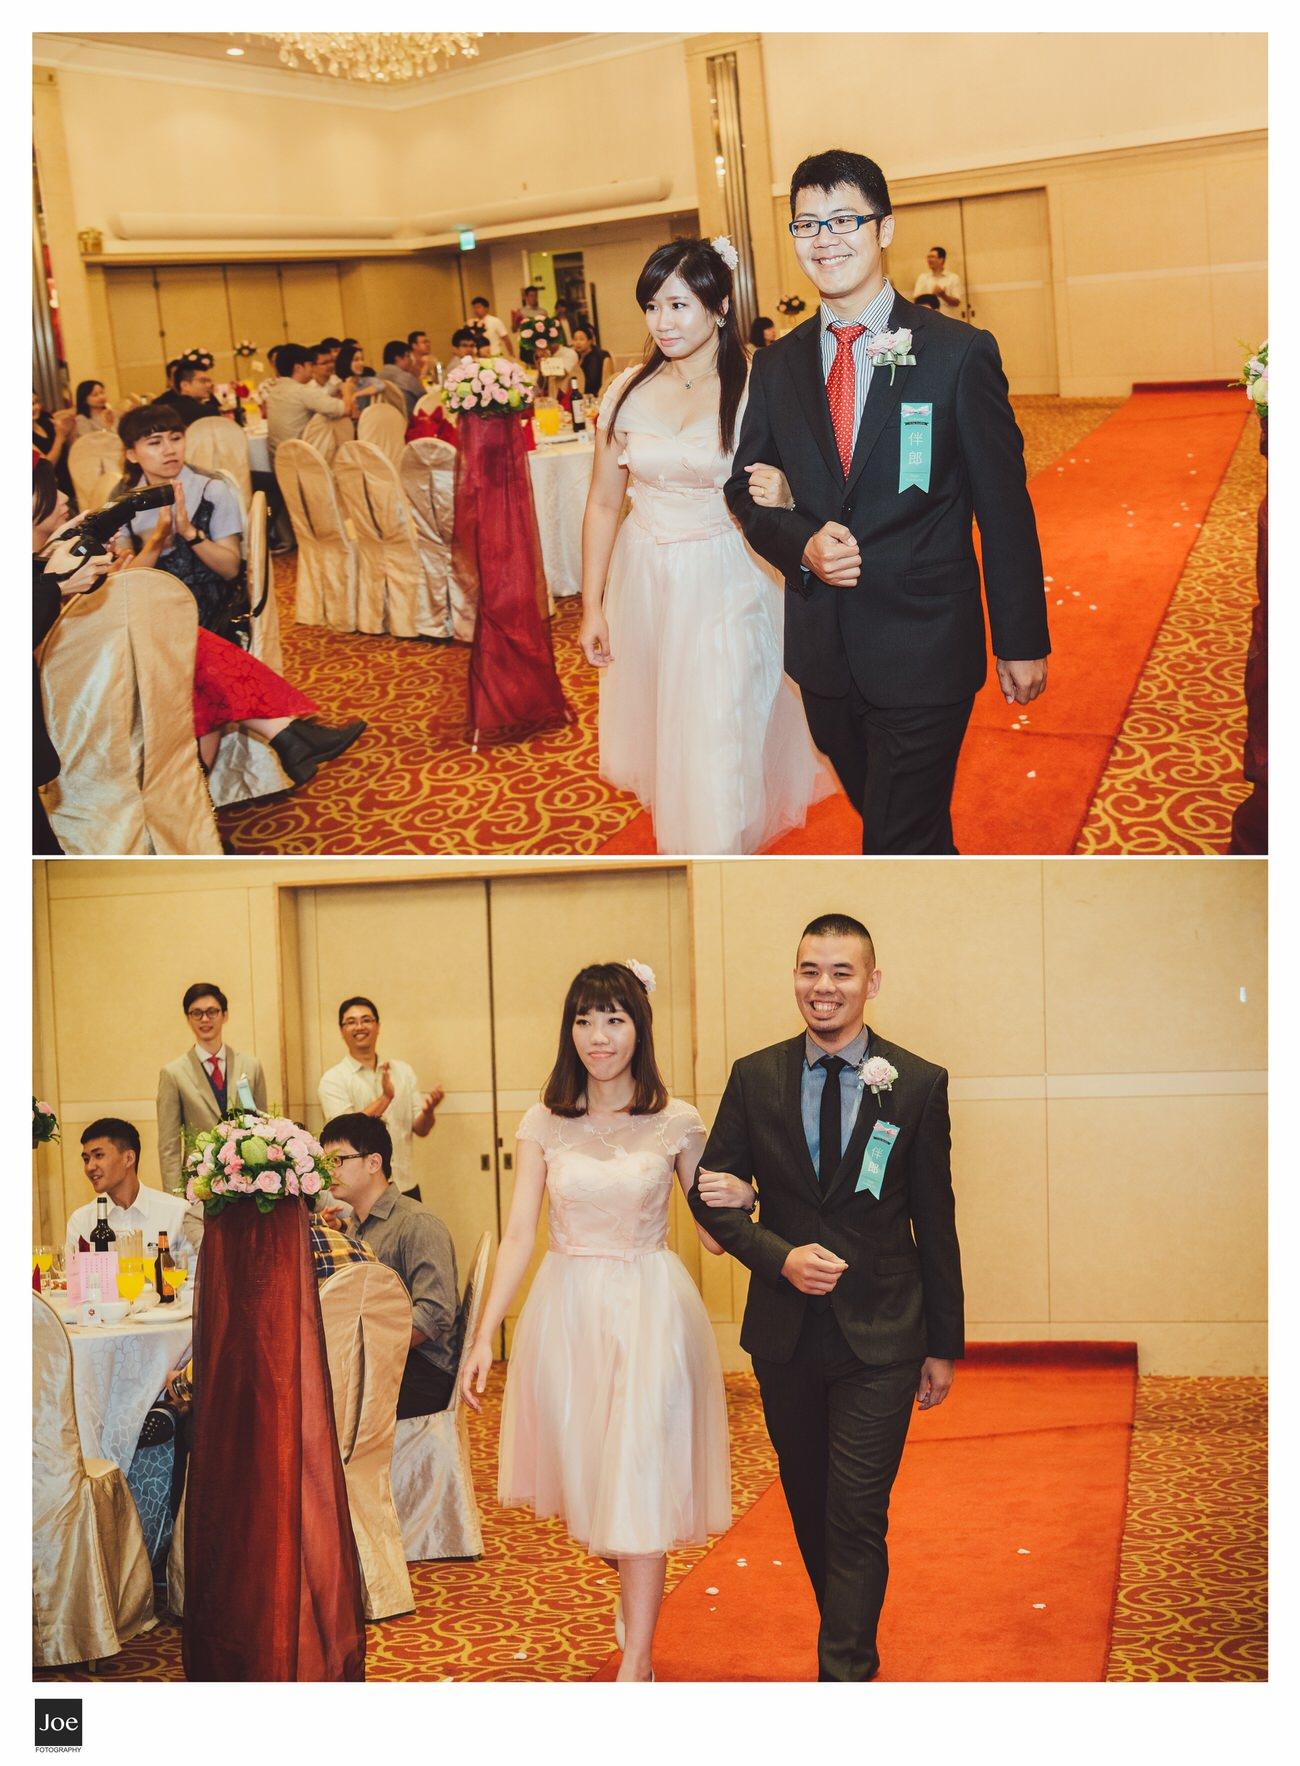 sunworld-dynasty-hotel-taipei-wedding-photo-joe-fotography-angel-jay-080.jpg